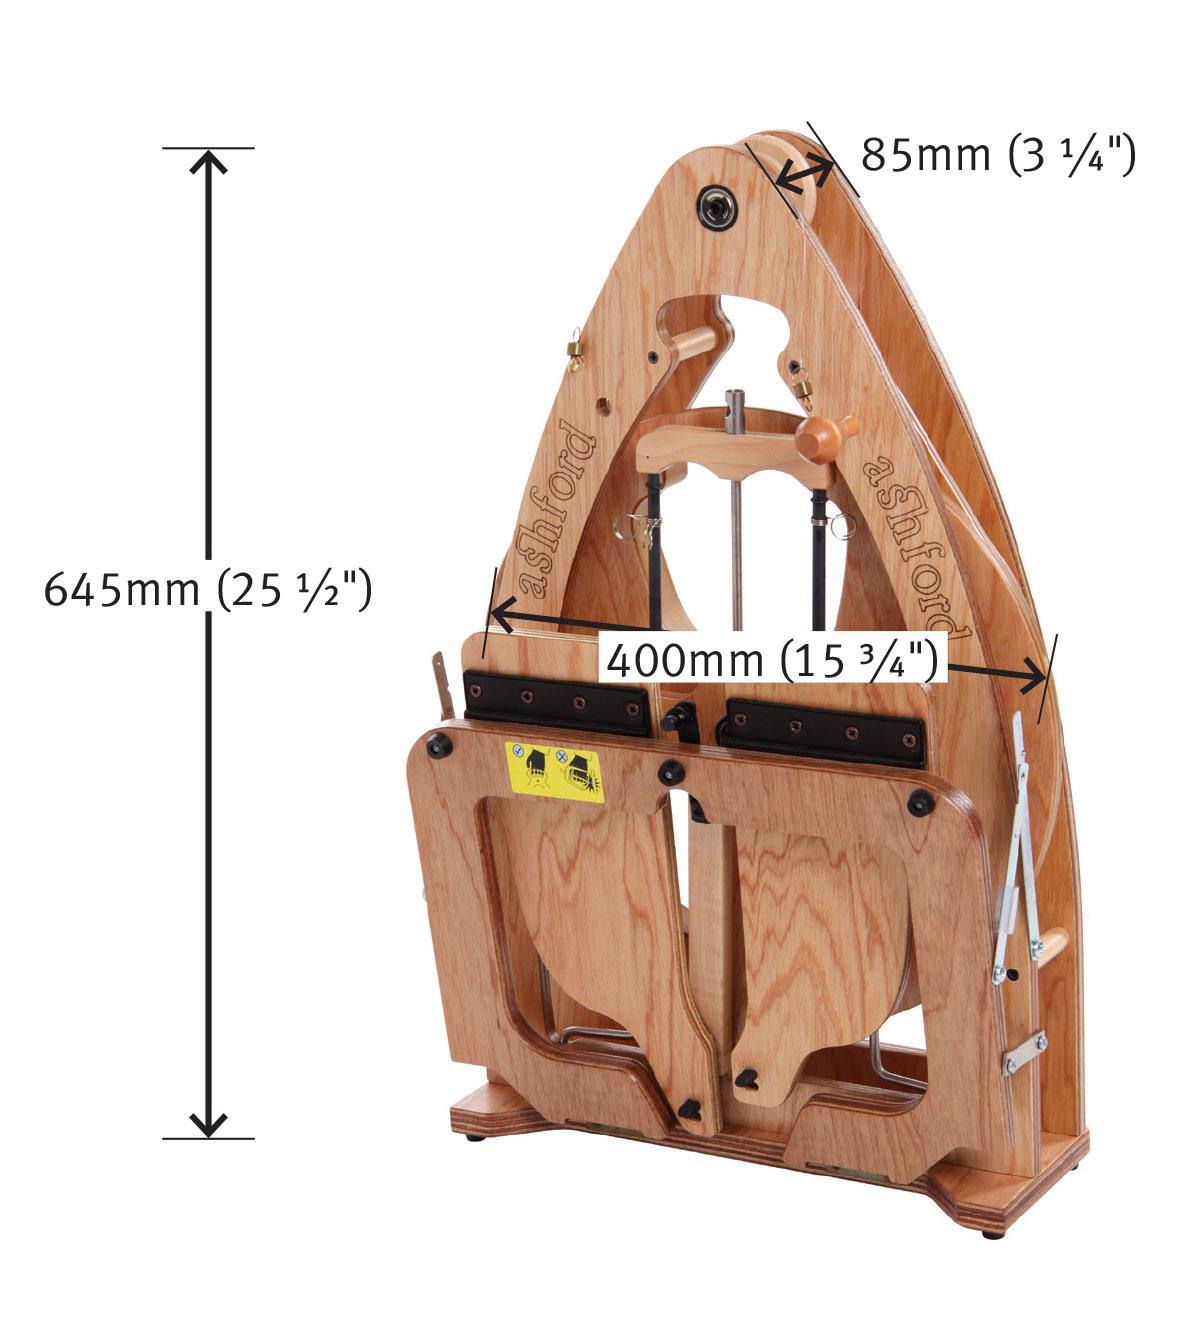 Joy 2 Double Treadle w/ Bag